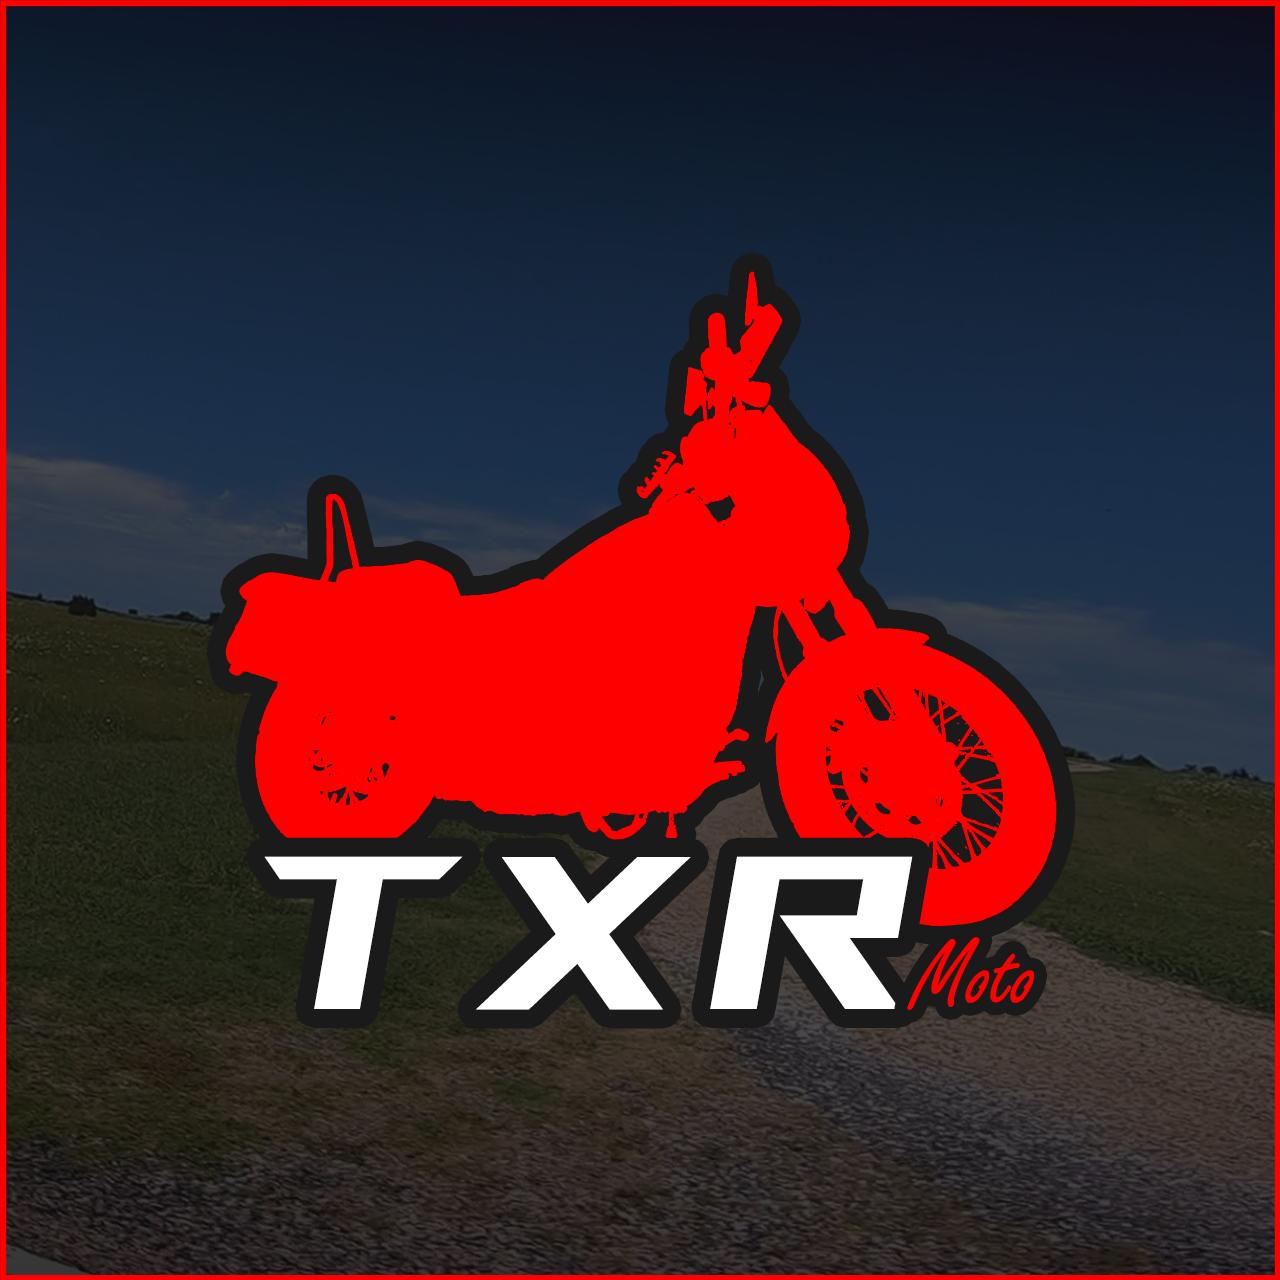 TXR Moto